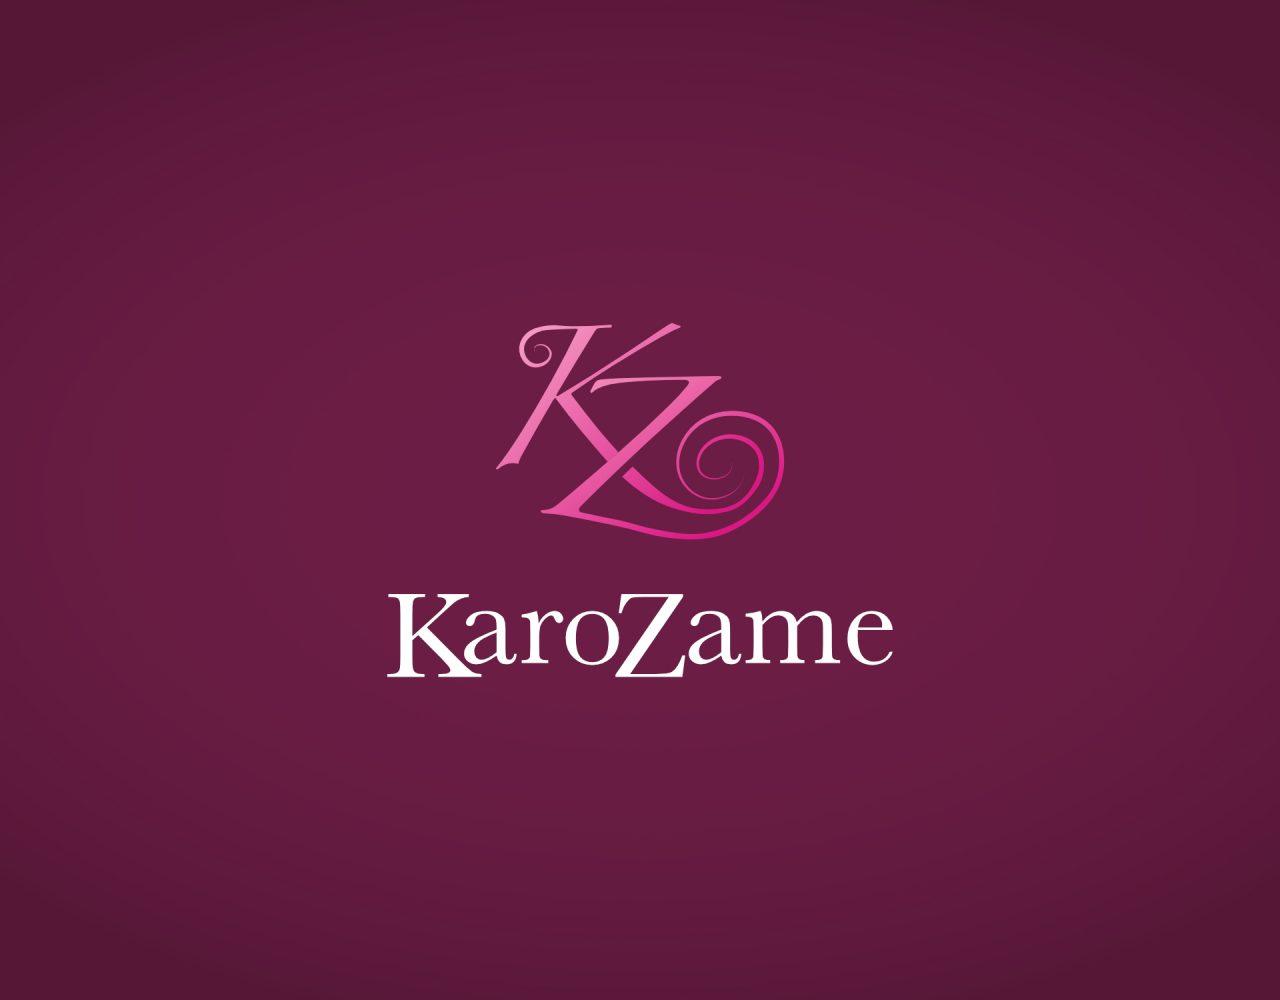 KaroZame Brand